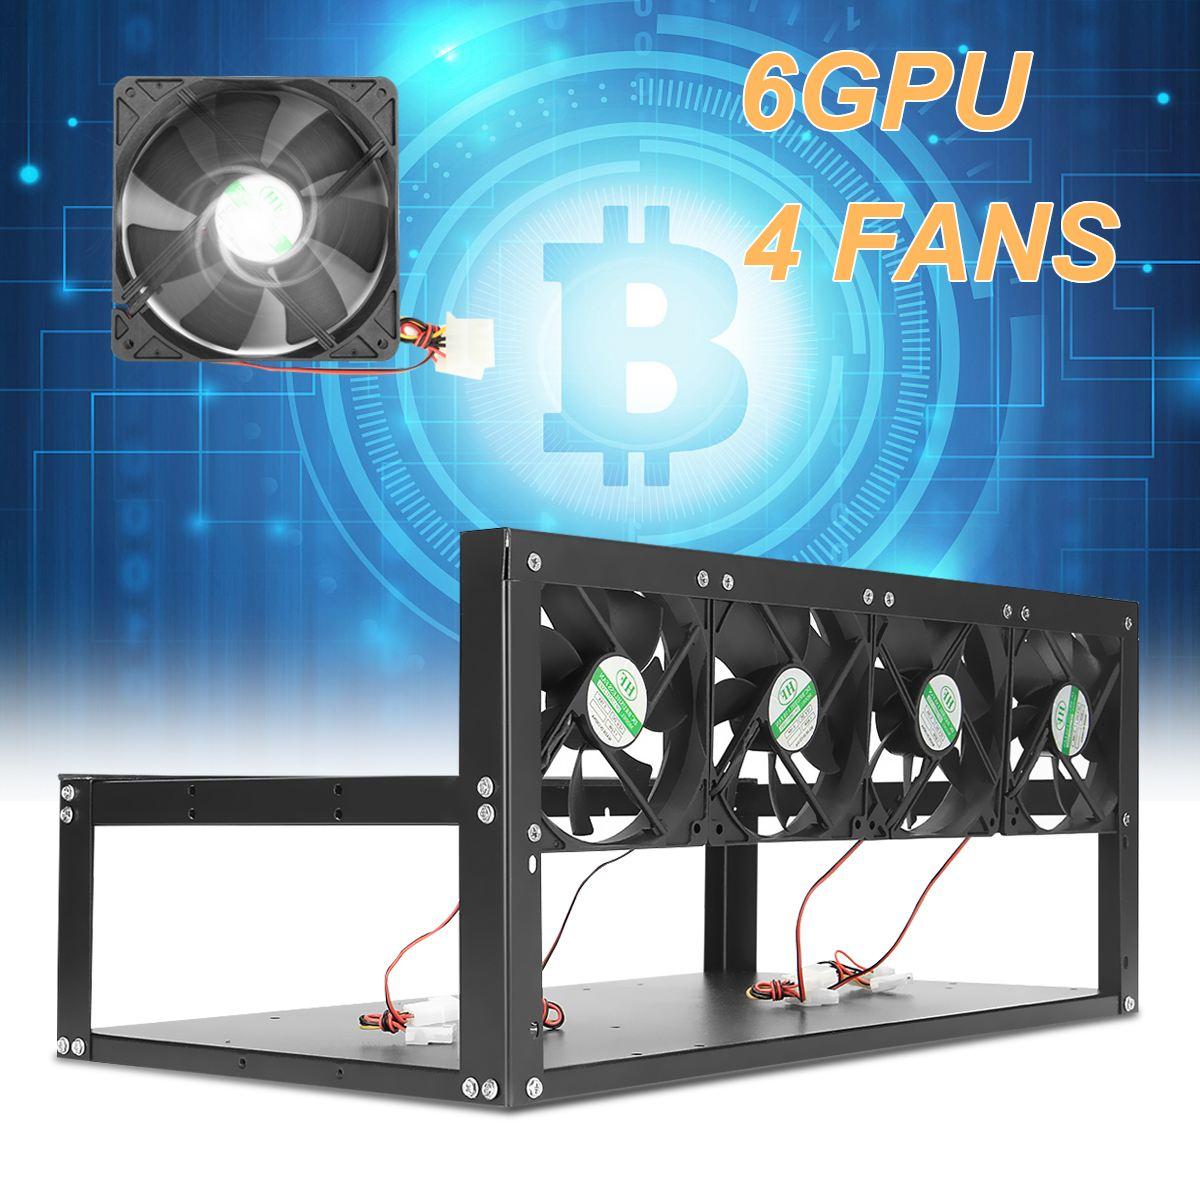 6 GPU 4 ventiladores Open Air Pro Mining Computer Alloy Case Frame Rig 4 para 6 GPU ETH BTC ZEC Ethereum